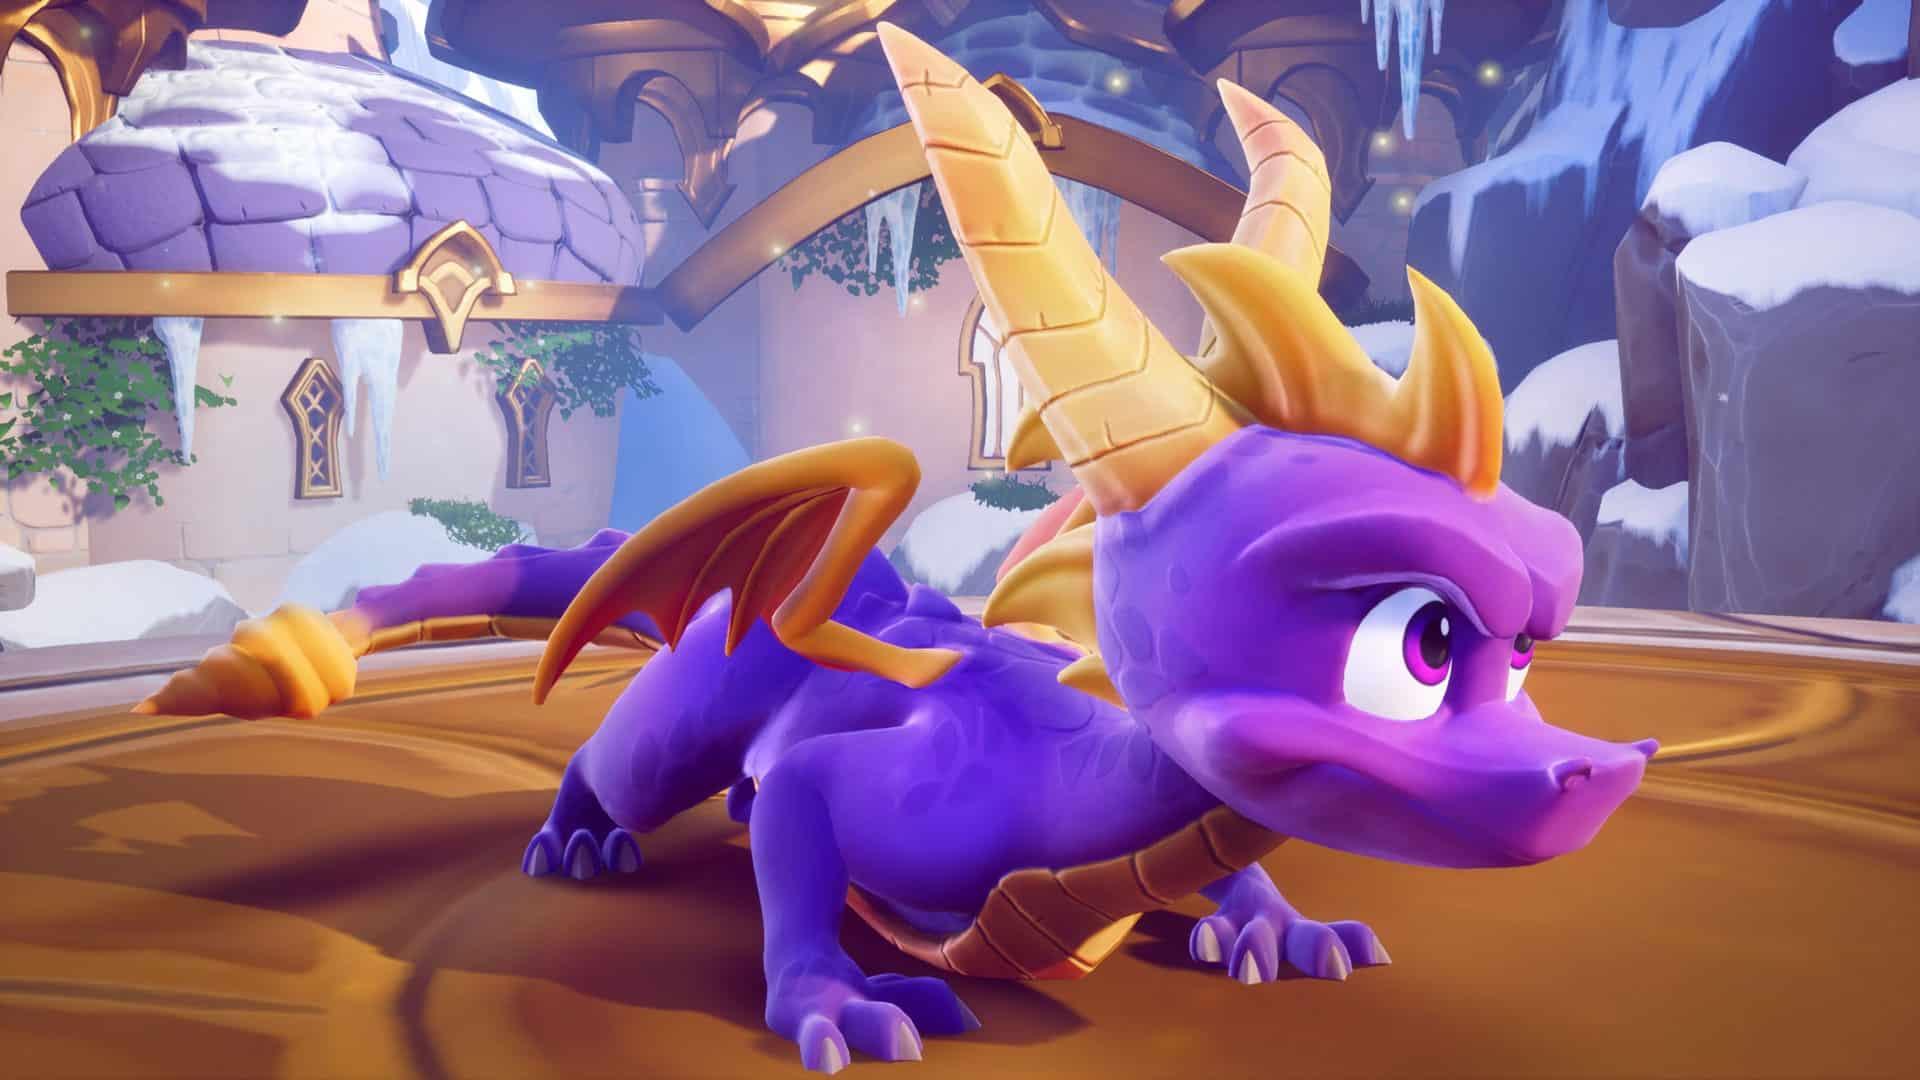 Spyro 4 video game Reignited Trilogy